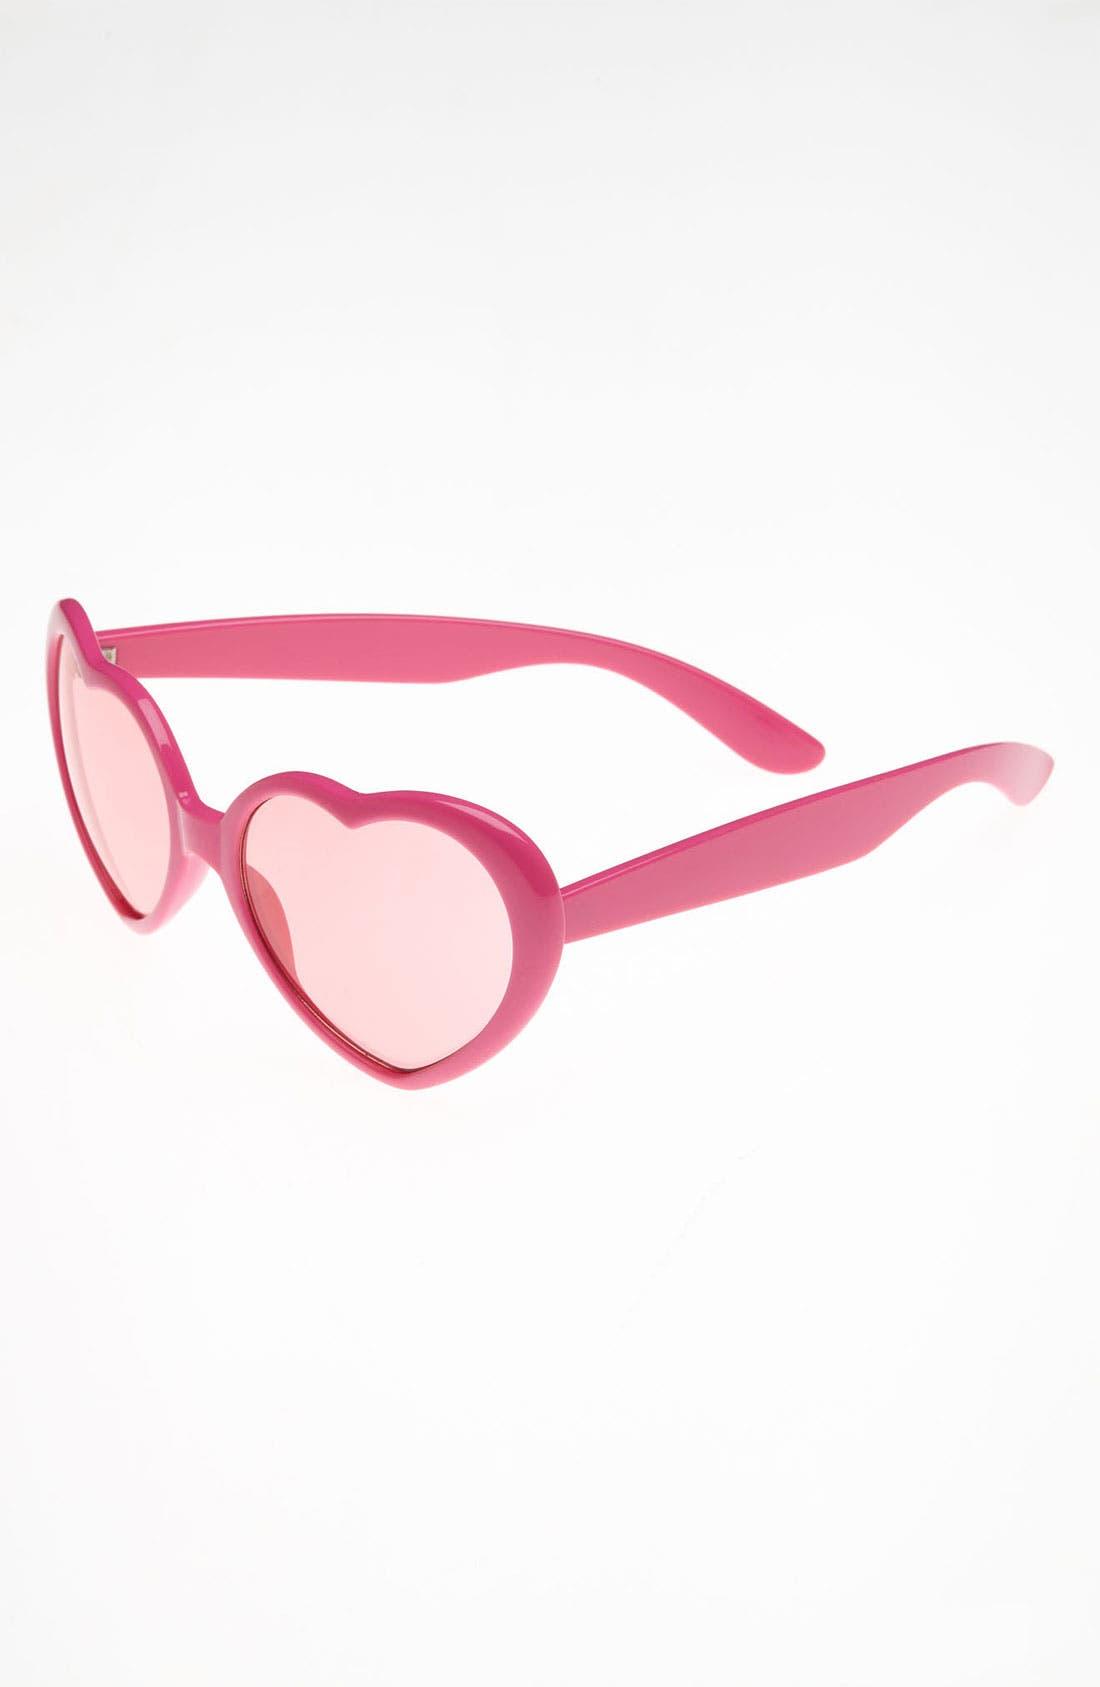 Alternate Image 1 Selected - Icon Eyewear Neon Sunglasses (Girls)